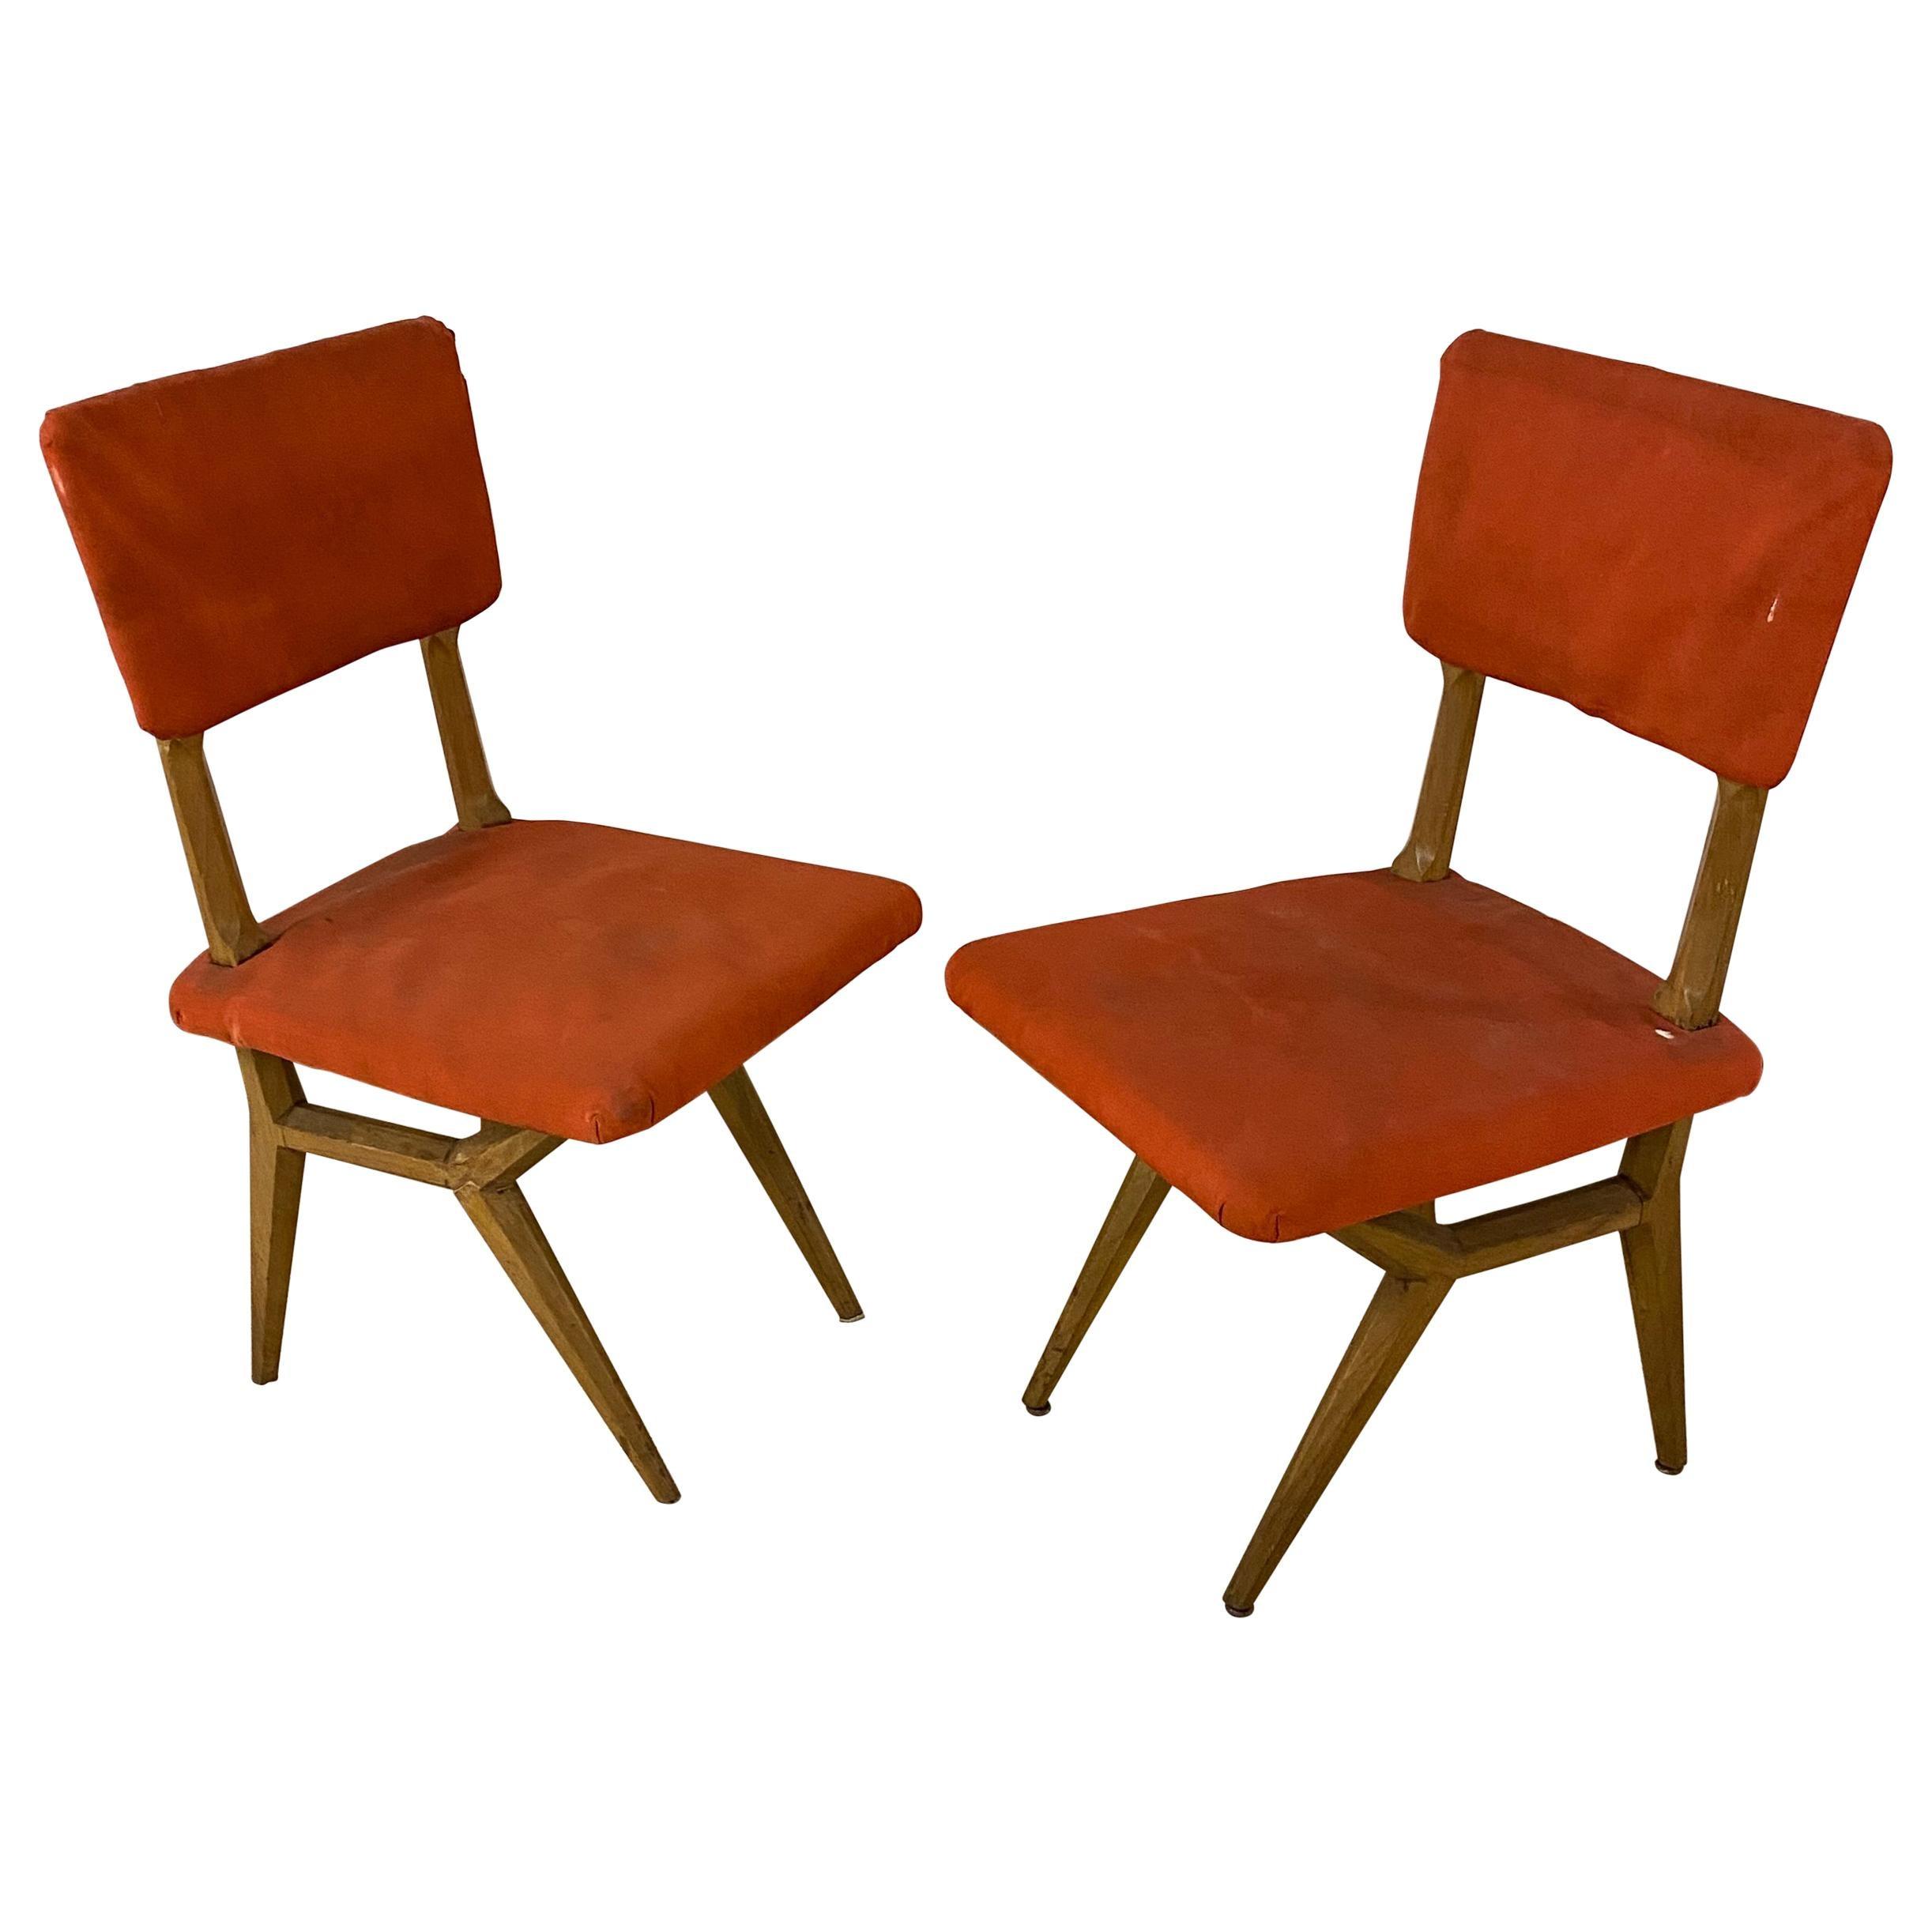 2 Chairs, Italy, circa 1950-1960